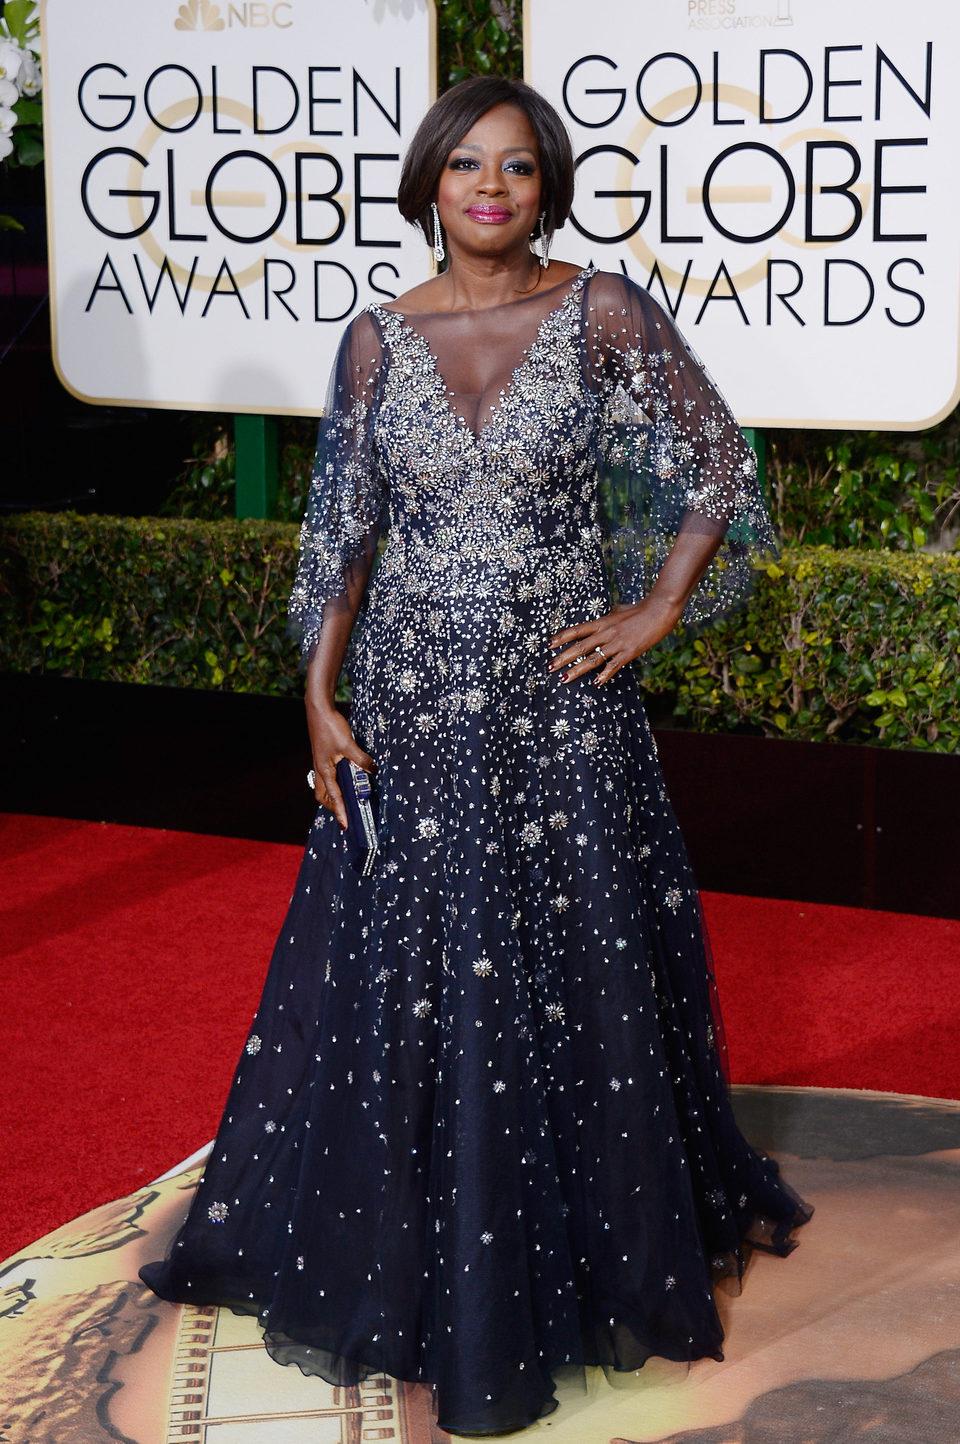 Viola Davis in the 2016 Golden Globes red carpet